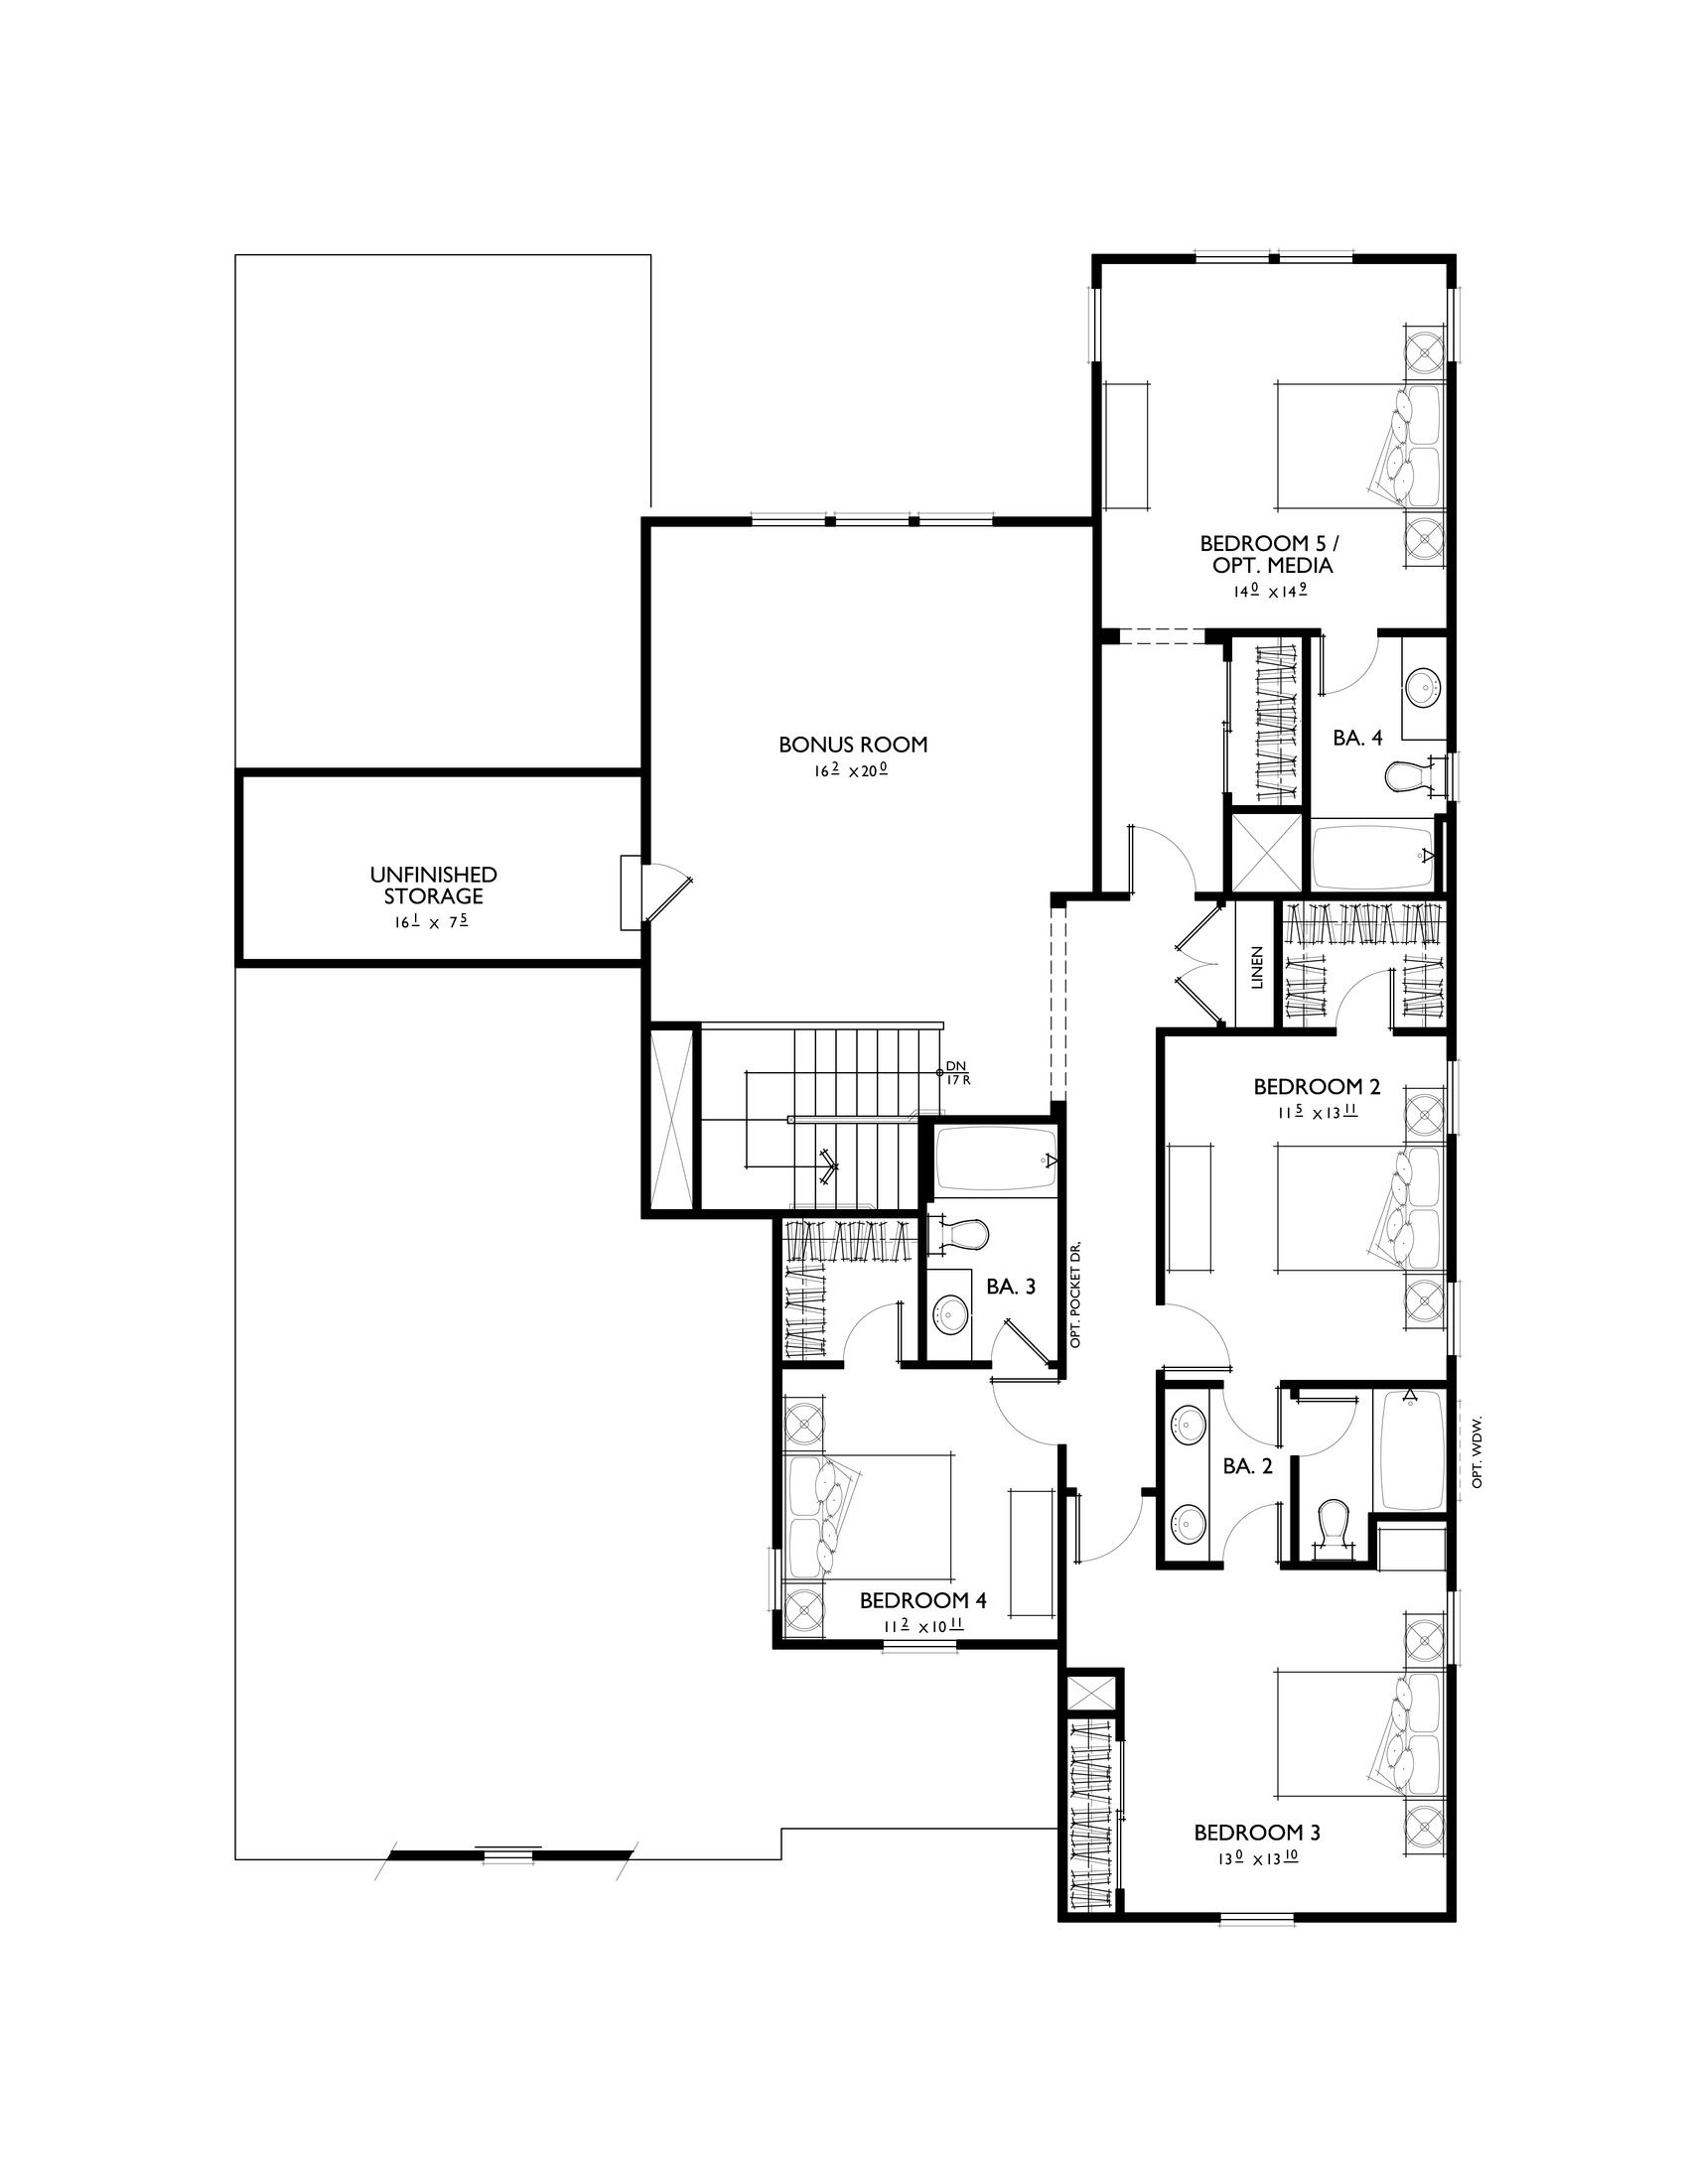 Classica Homes Luxury House Designs Floor Plans Luxury Homes